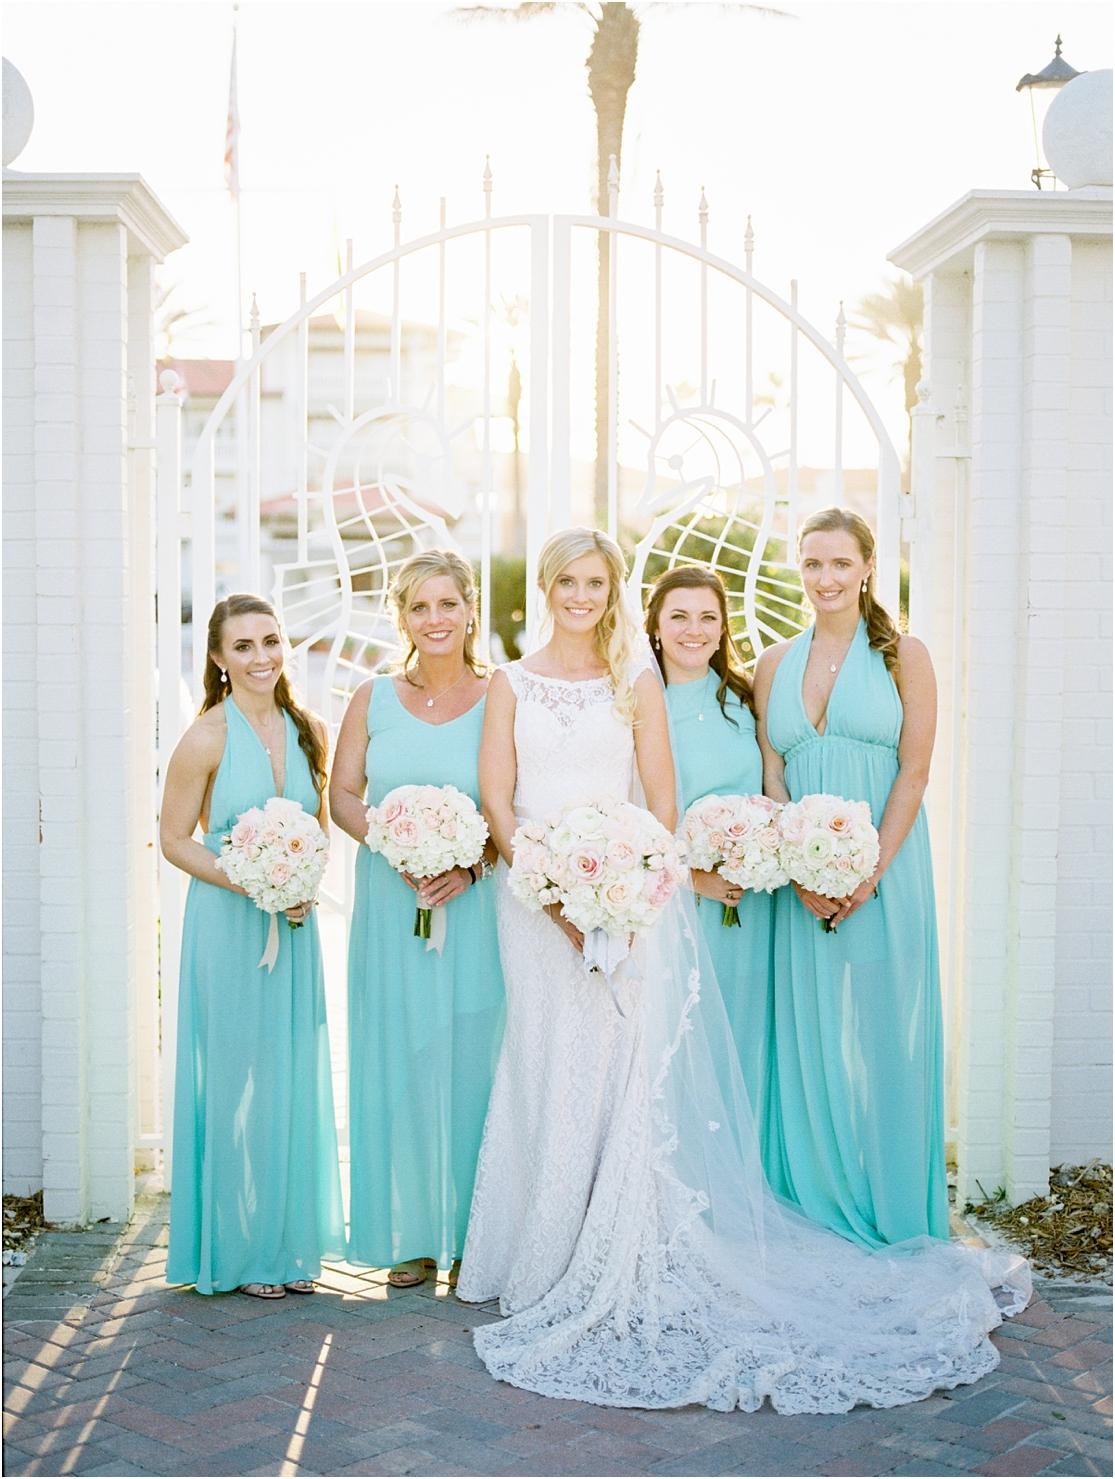 Lisa Silva Photography- Ponte Vedra Beach and Jacksonville, Florida Fine Art Film Wedding Photography- Wedding at the Ponte Vedra Inn and Club_0026.jpg